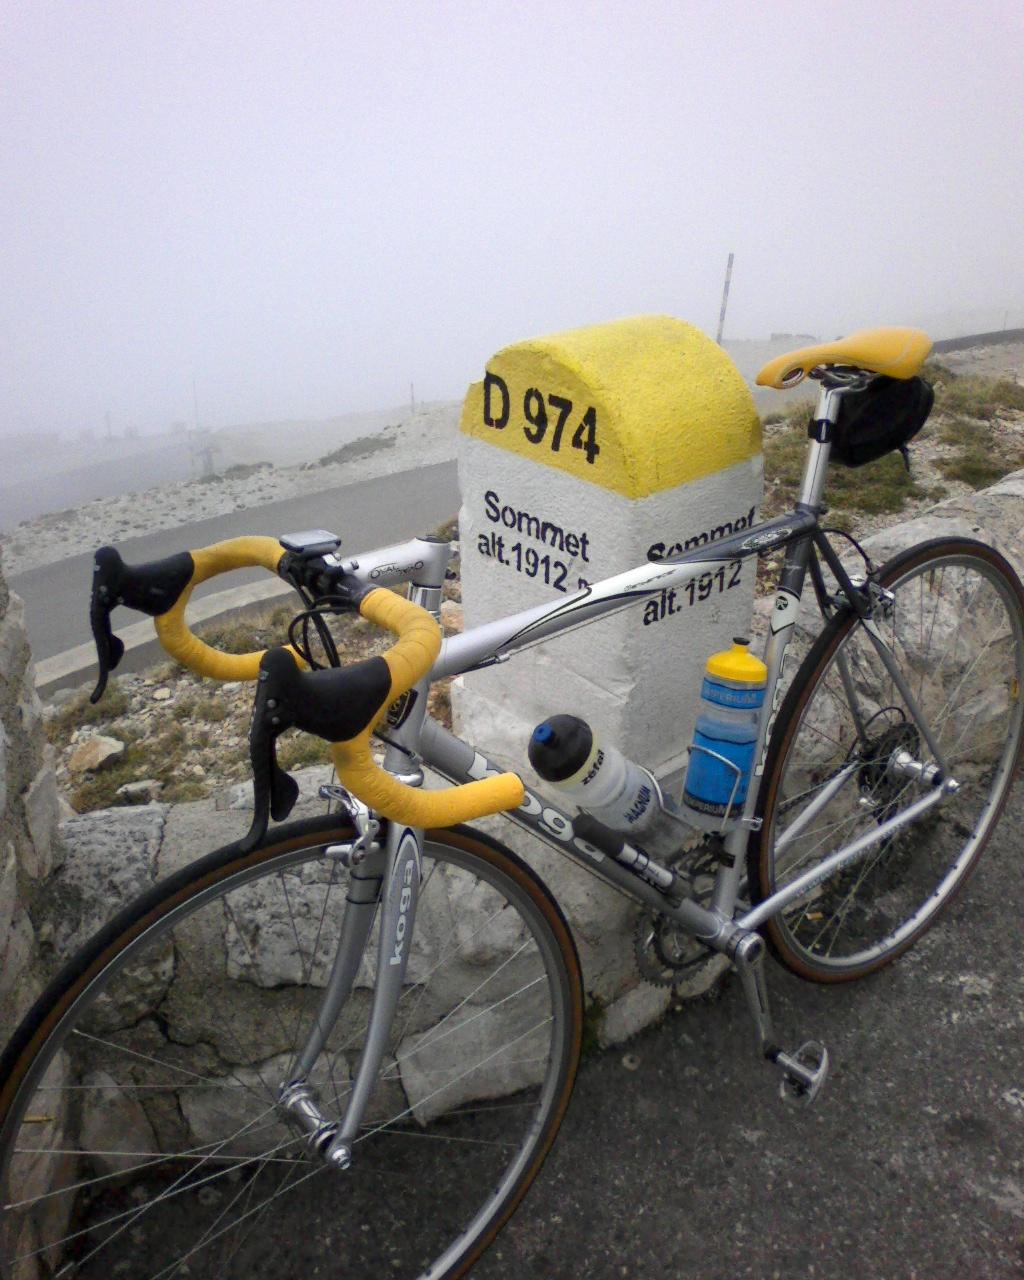 Ventoux Rad am Gipfel.jpg